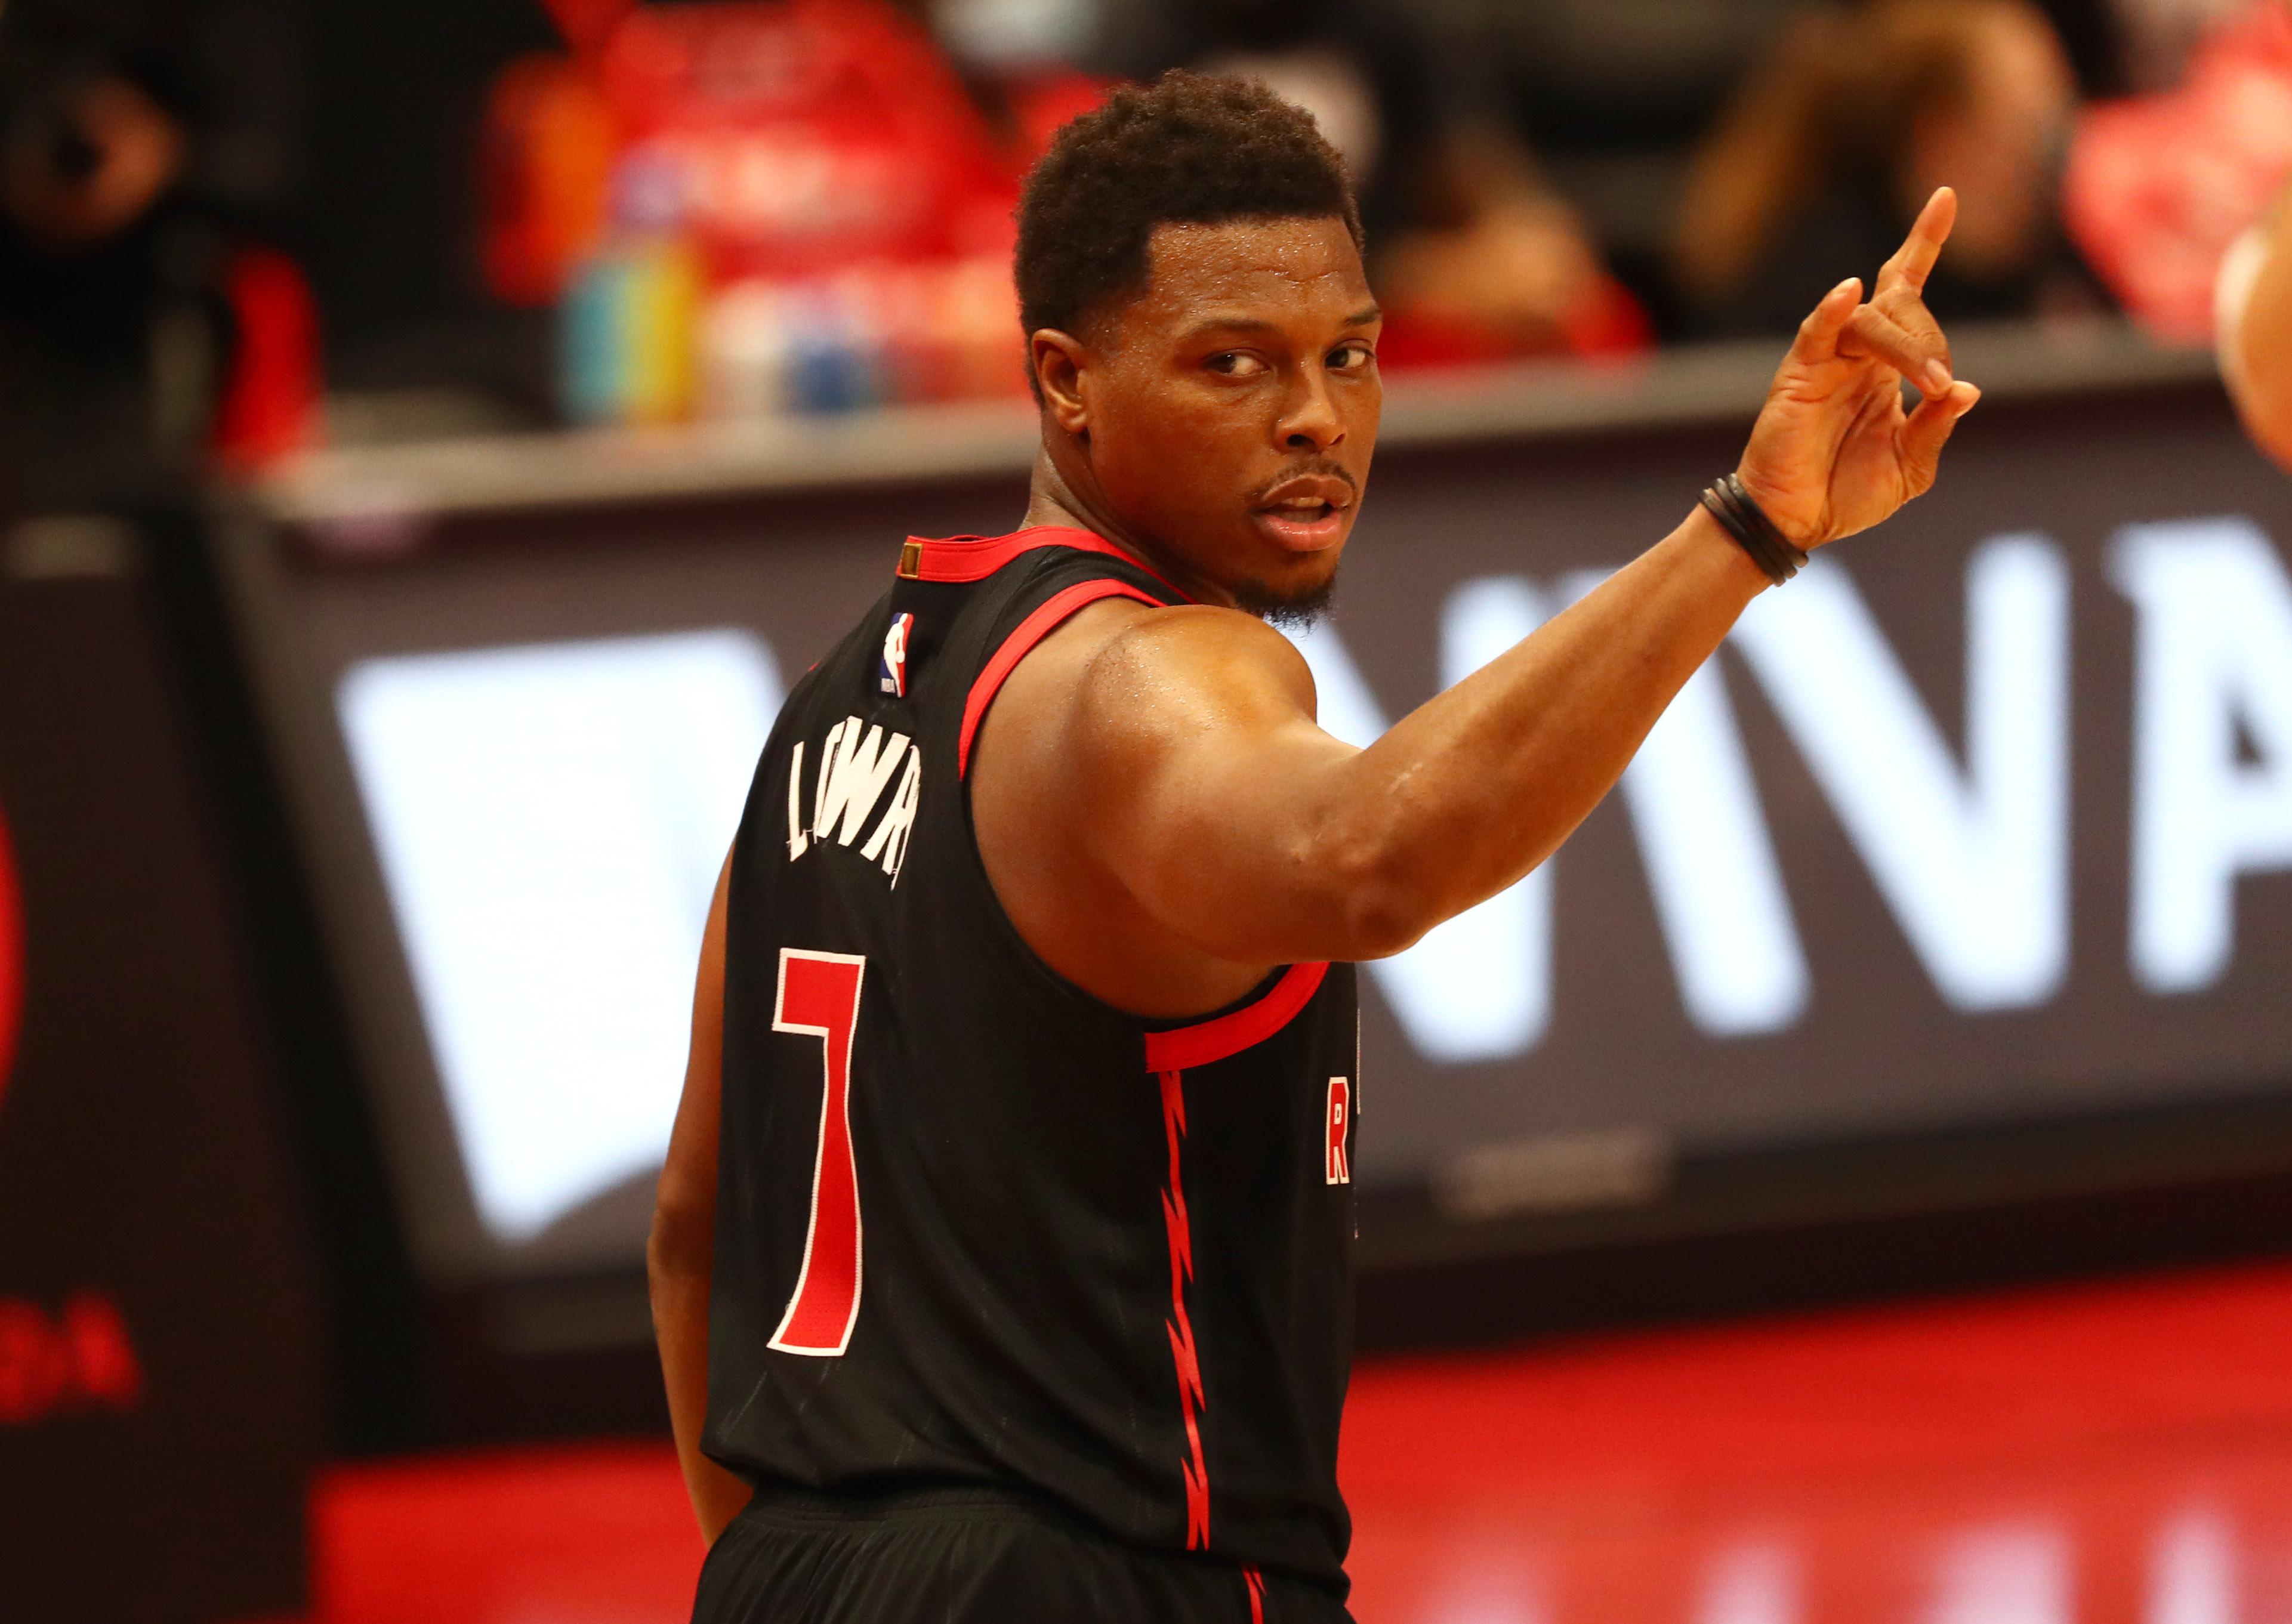 NBA: Dallas Mavericks at Toronto Raptors